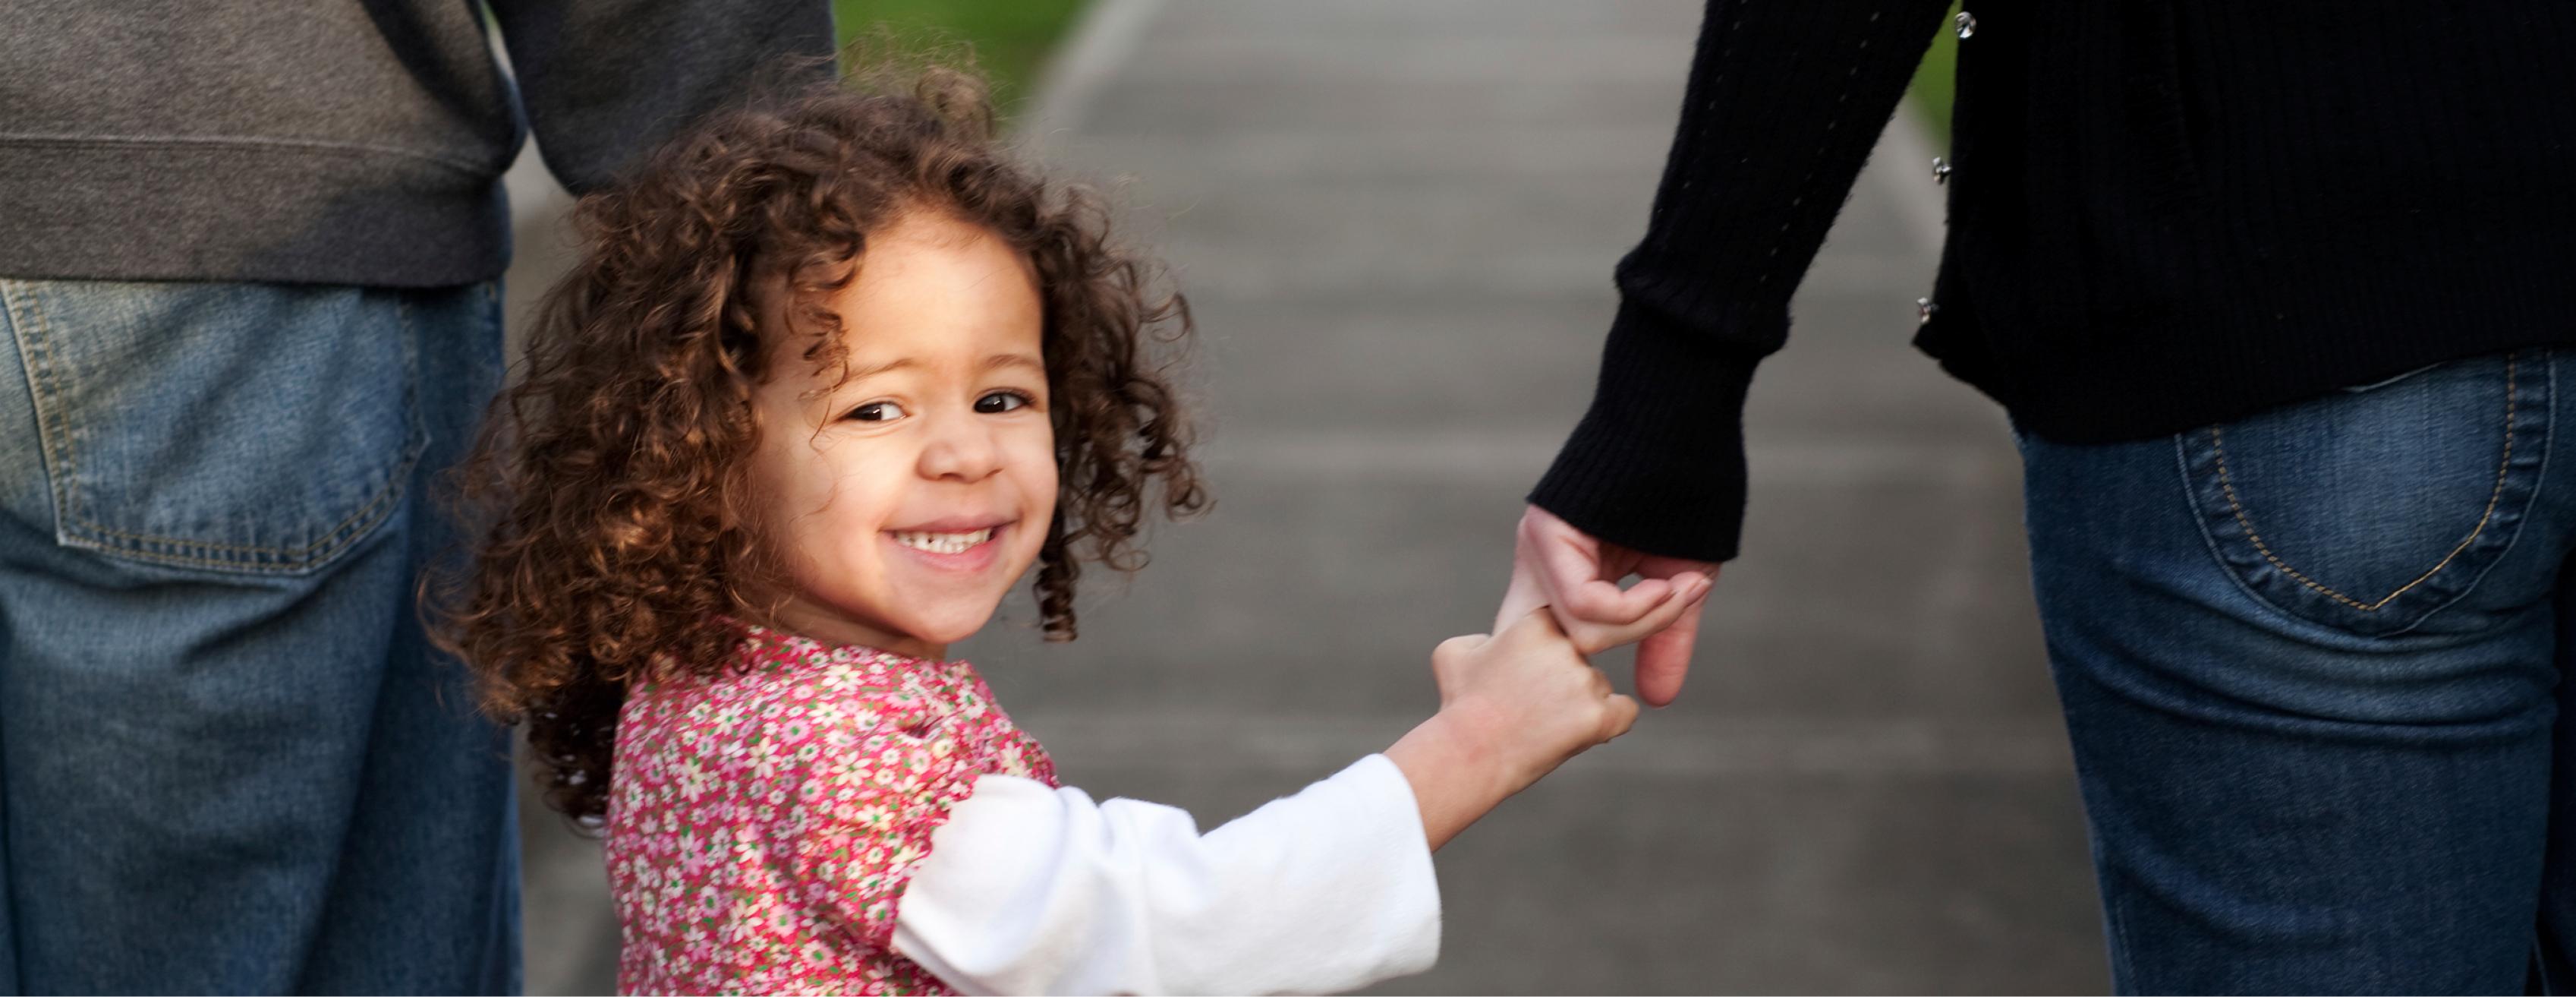 Child Adoption in Lubbock, Tx